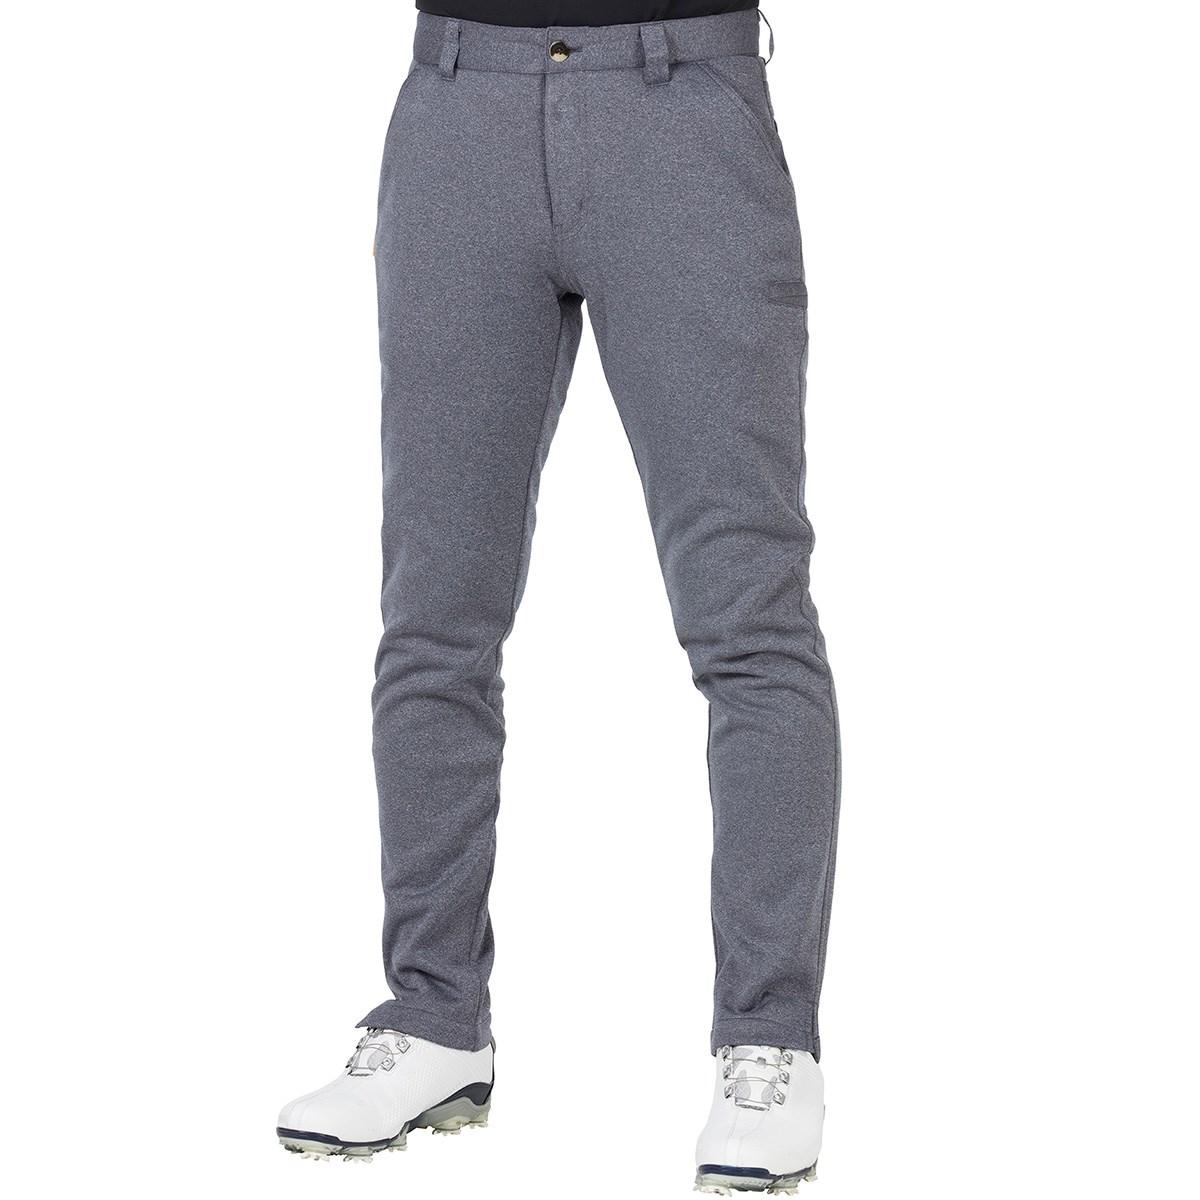 GDO オリジナル GDO ORIGINAL 7ポケットボンディングパンツ 股下79cm 1:ウエスト目安75-77 杢ネイビー